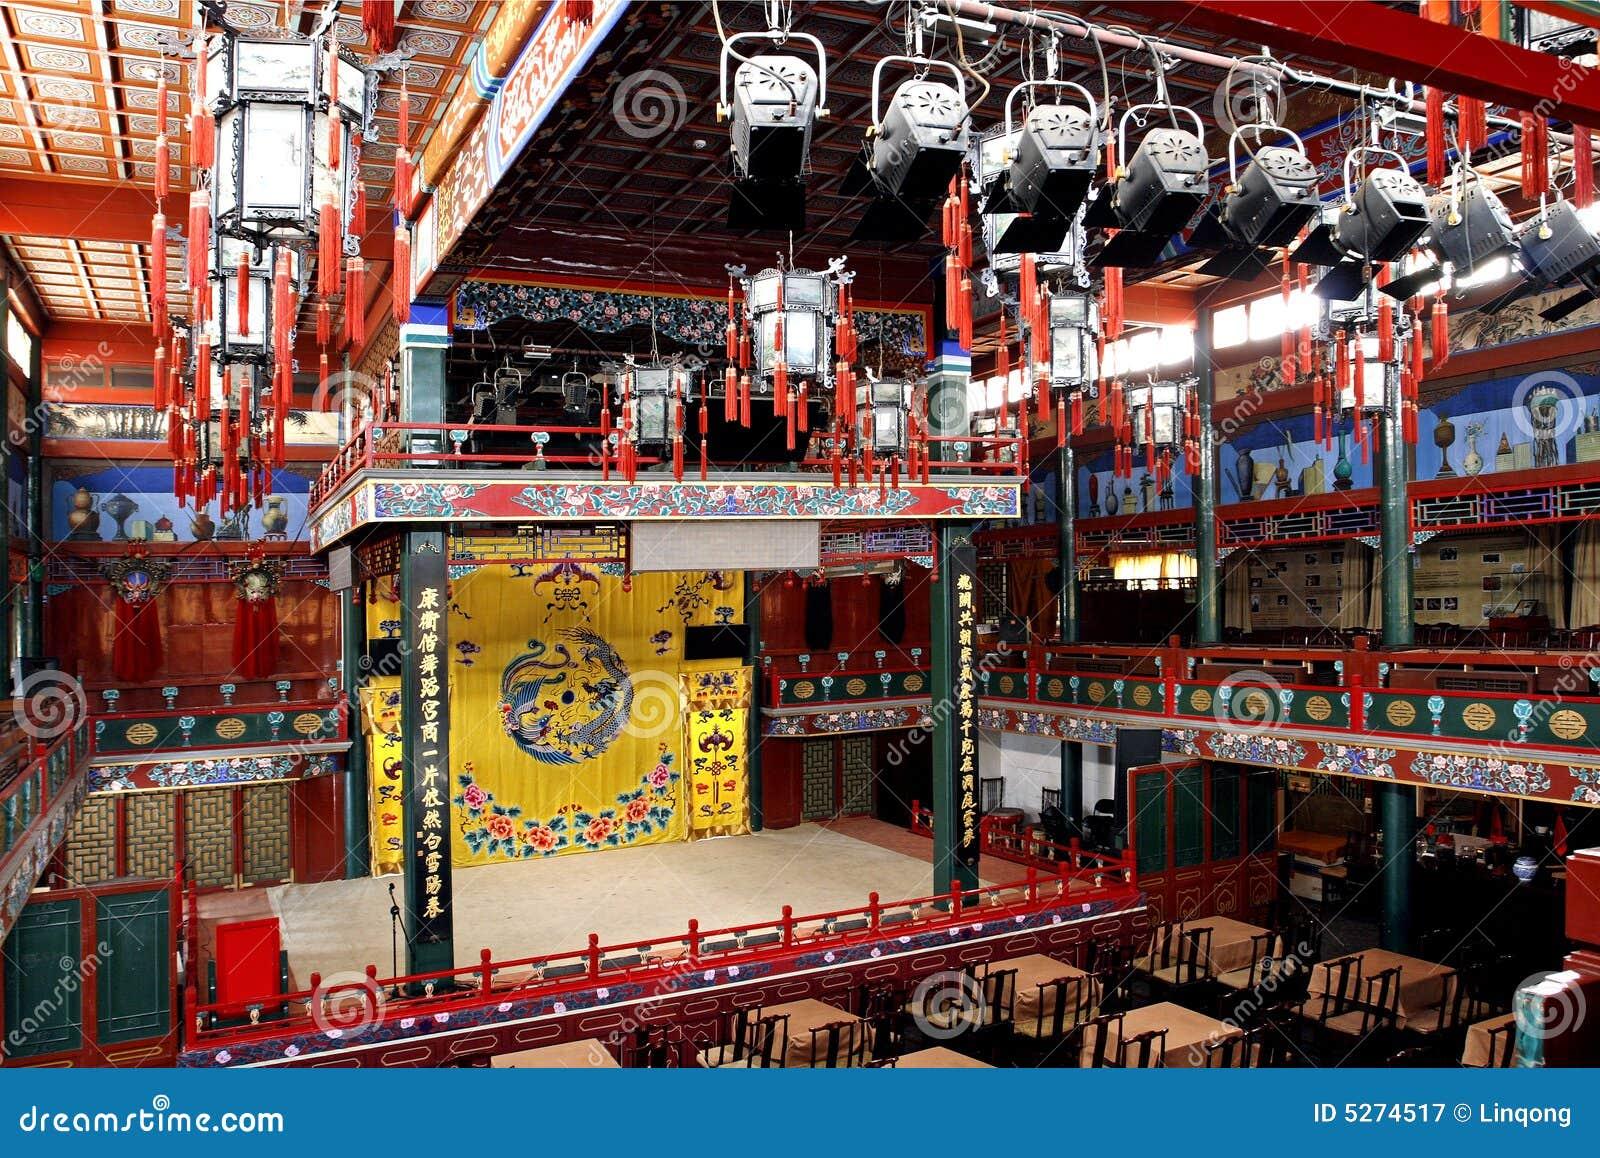 Altes Theater von China.